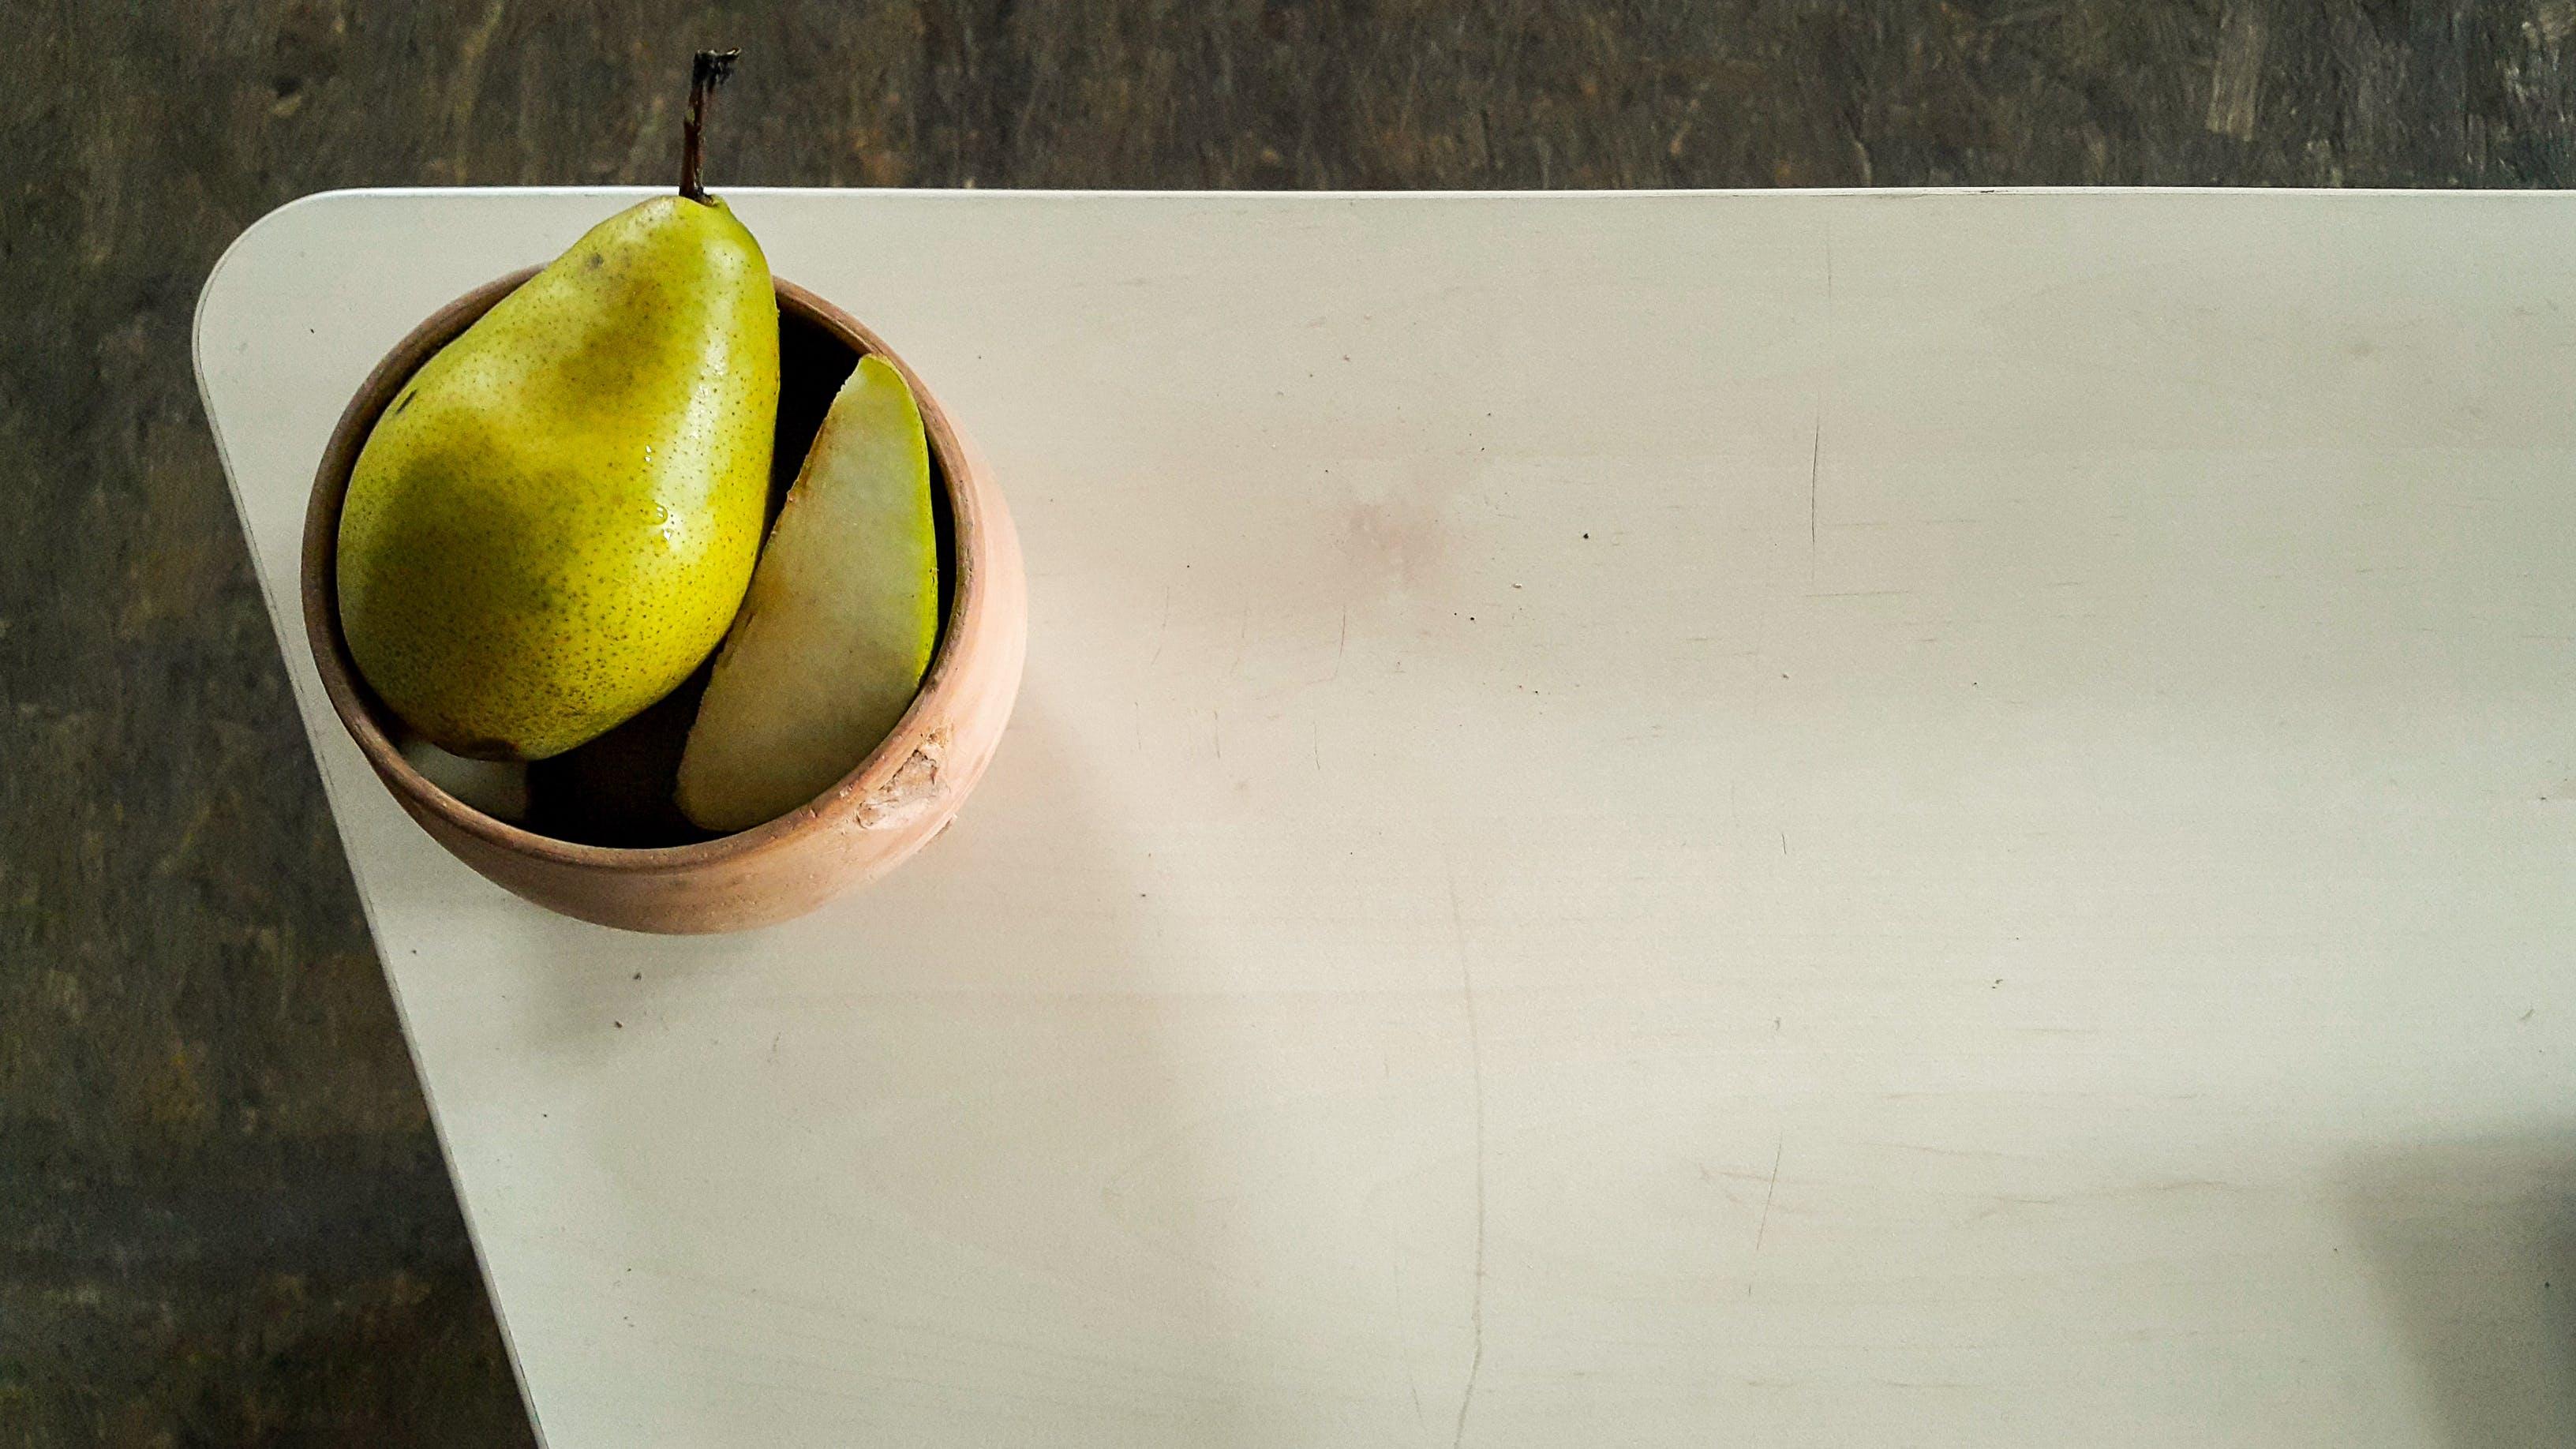 Free stock photo of food, food on the table, minimalism, pear